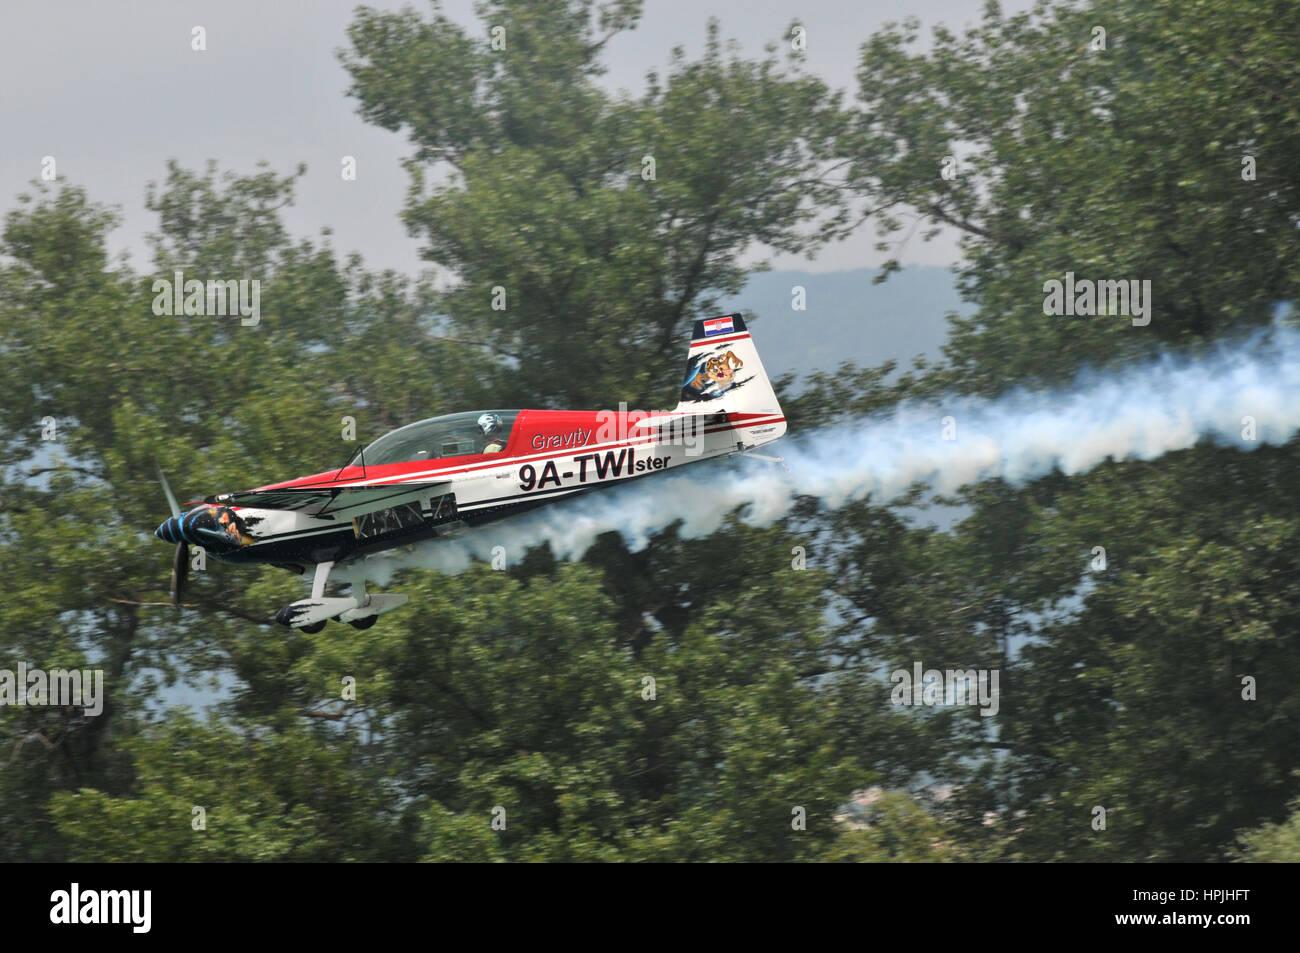 Croatian pilot Branimir Ambrekovic in his Extra 300 'Twister' aerobatic plane performs stunt trailing white - Stock Image